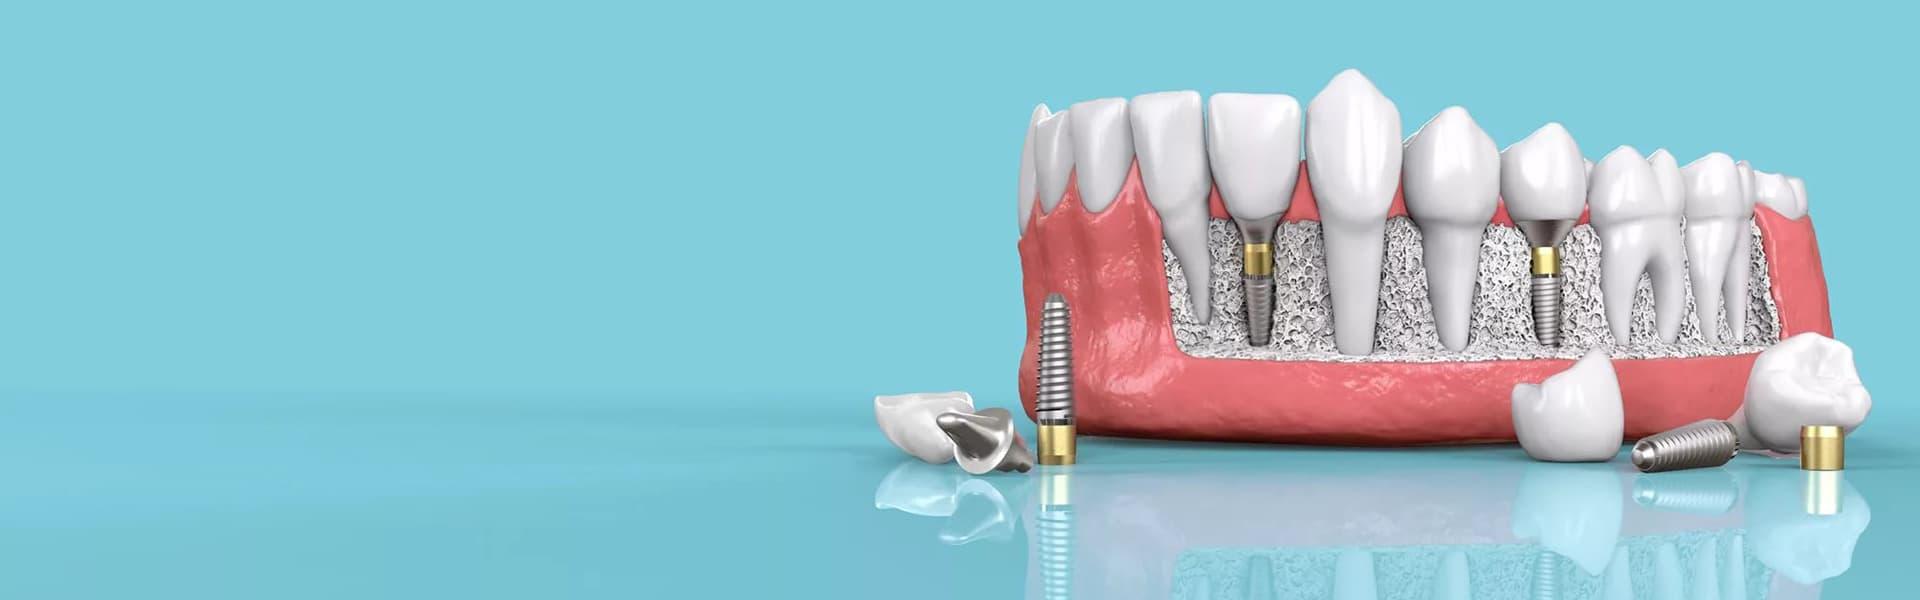 Имплантация зубов без костной пластики фото